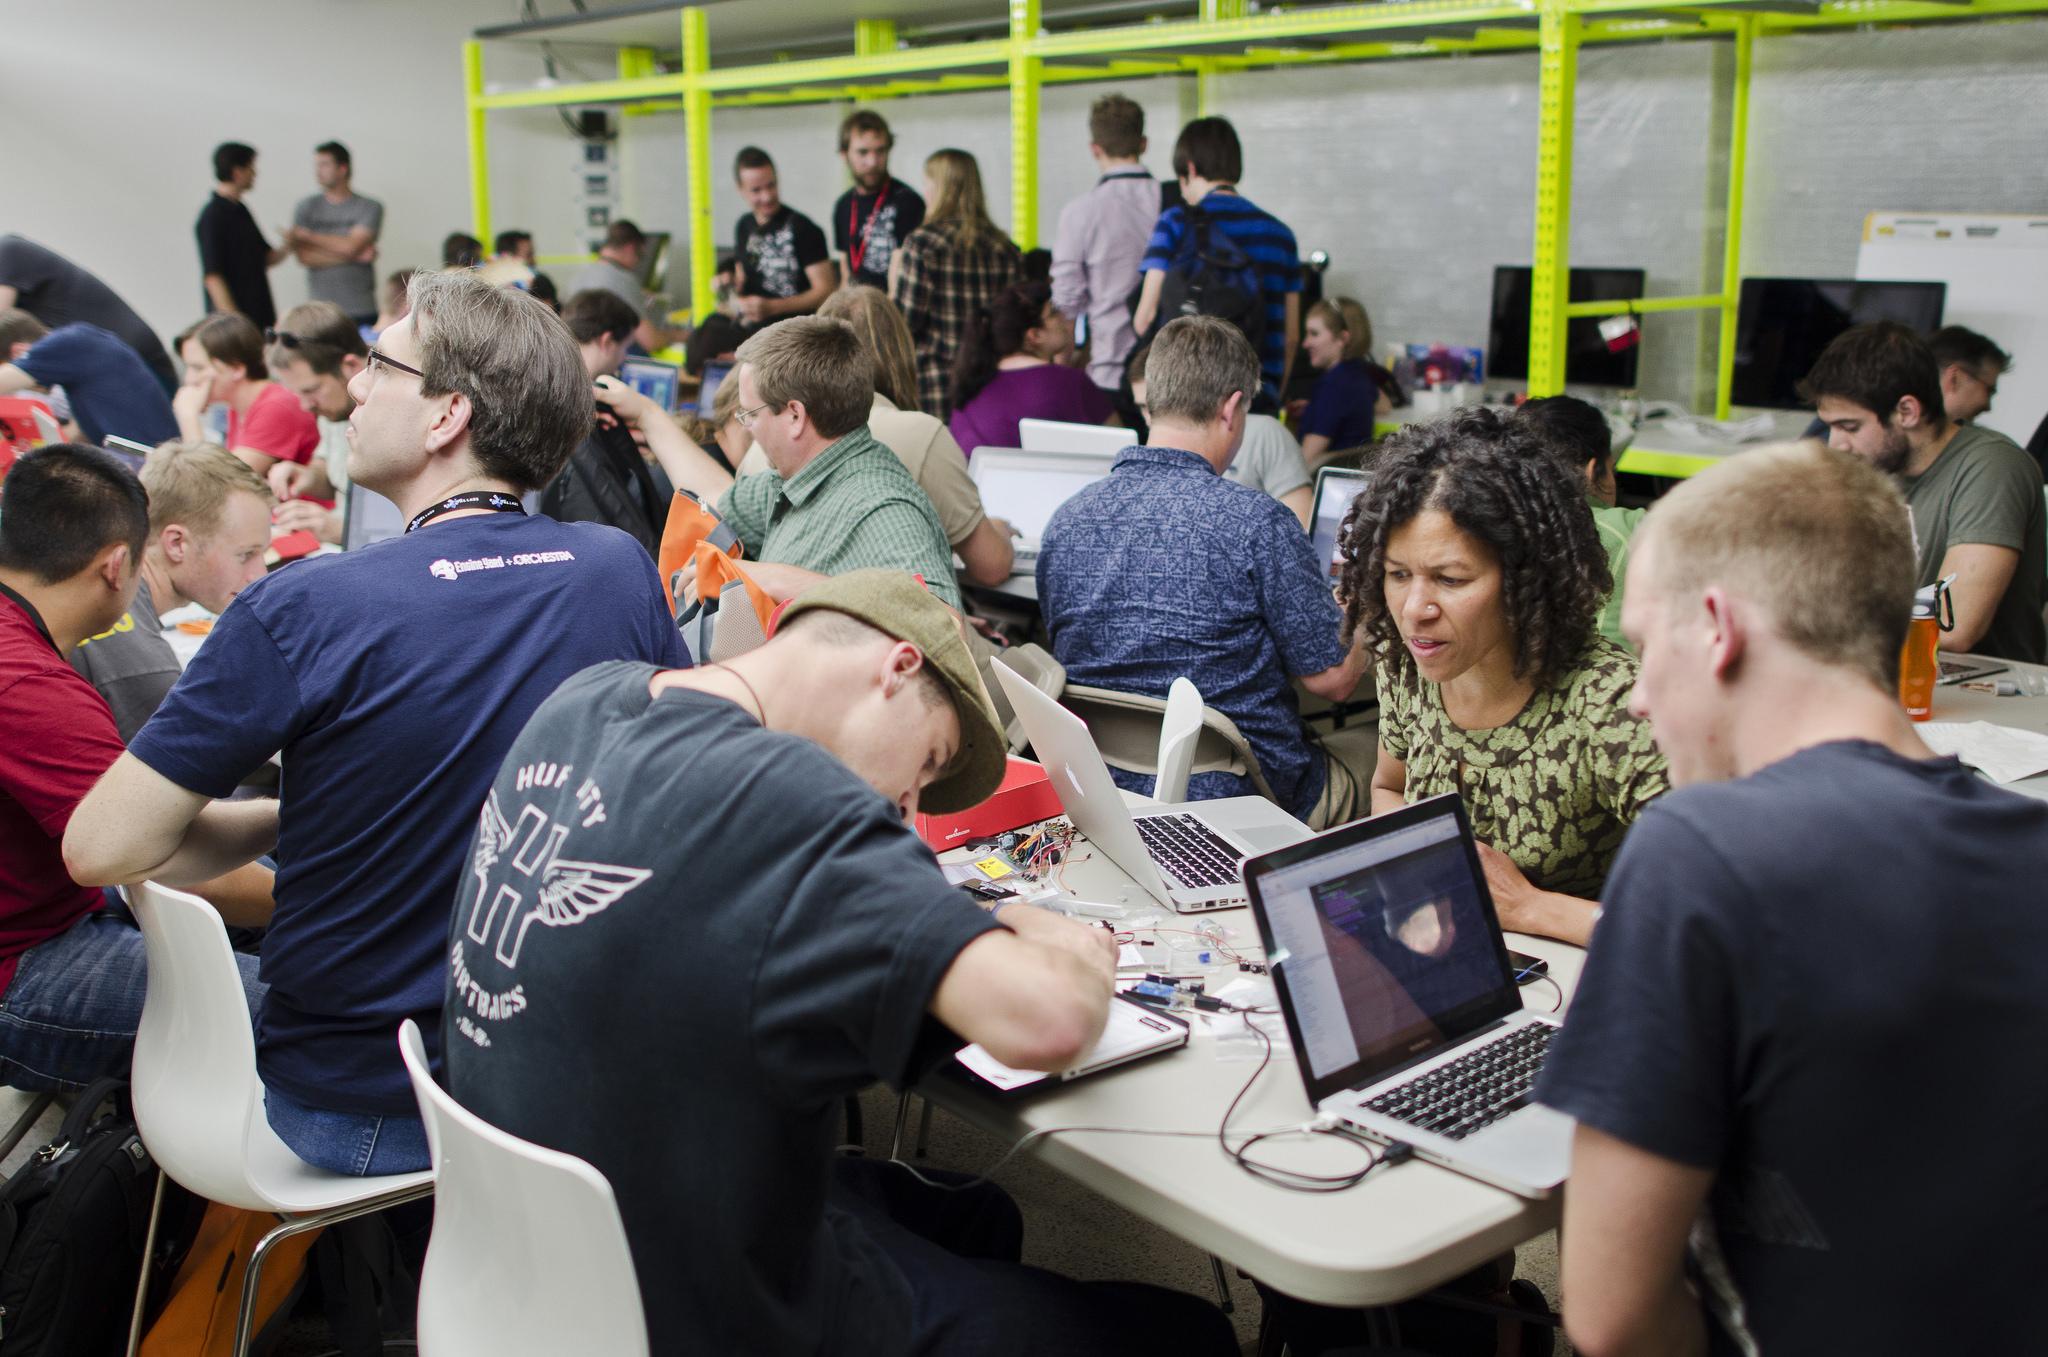 Getting into Arduino as a Hobby - News - SparkFun Electronics